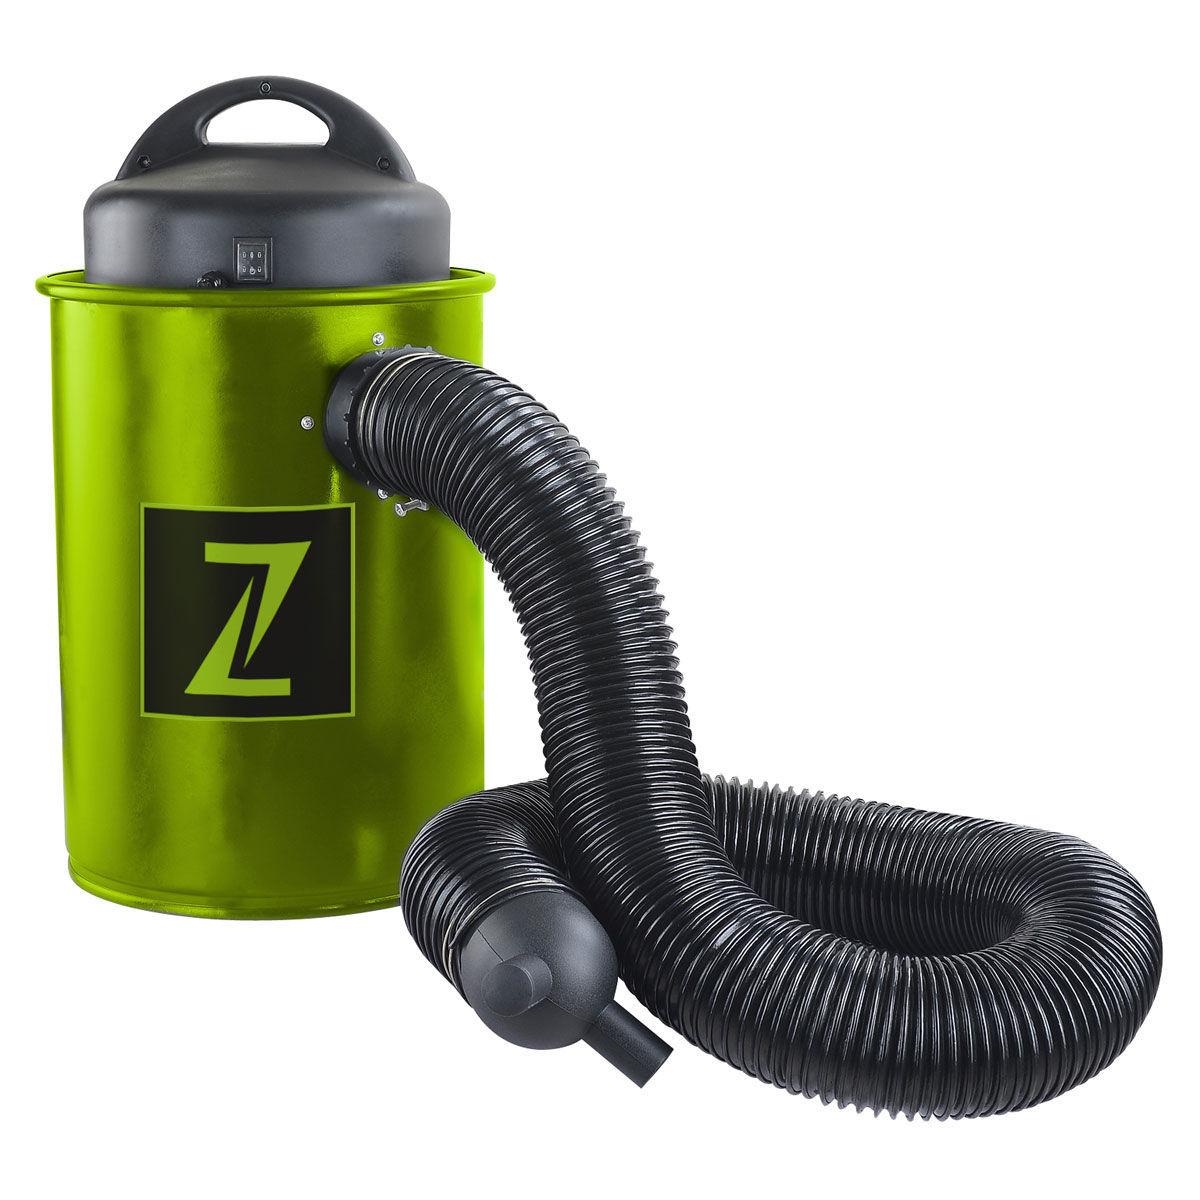 Image of   ZI-ASA305 Spånsuger Zipper